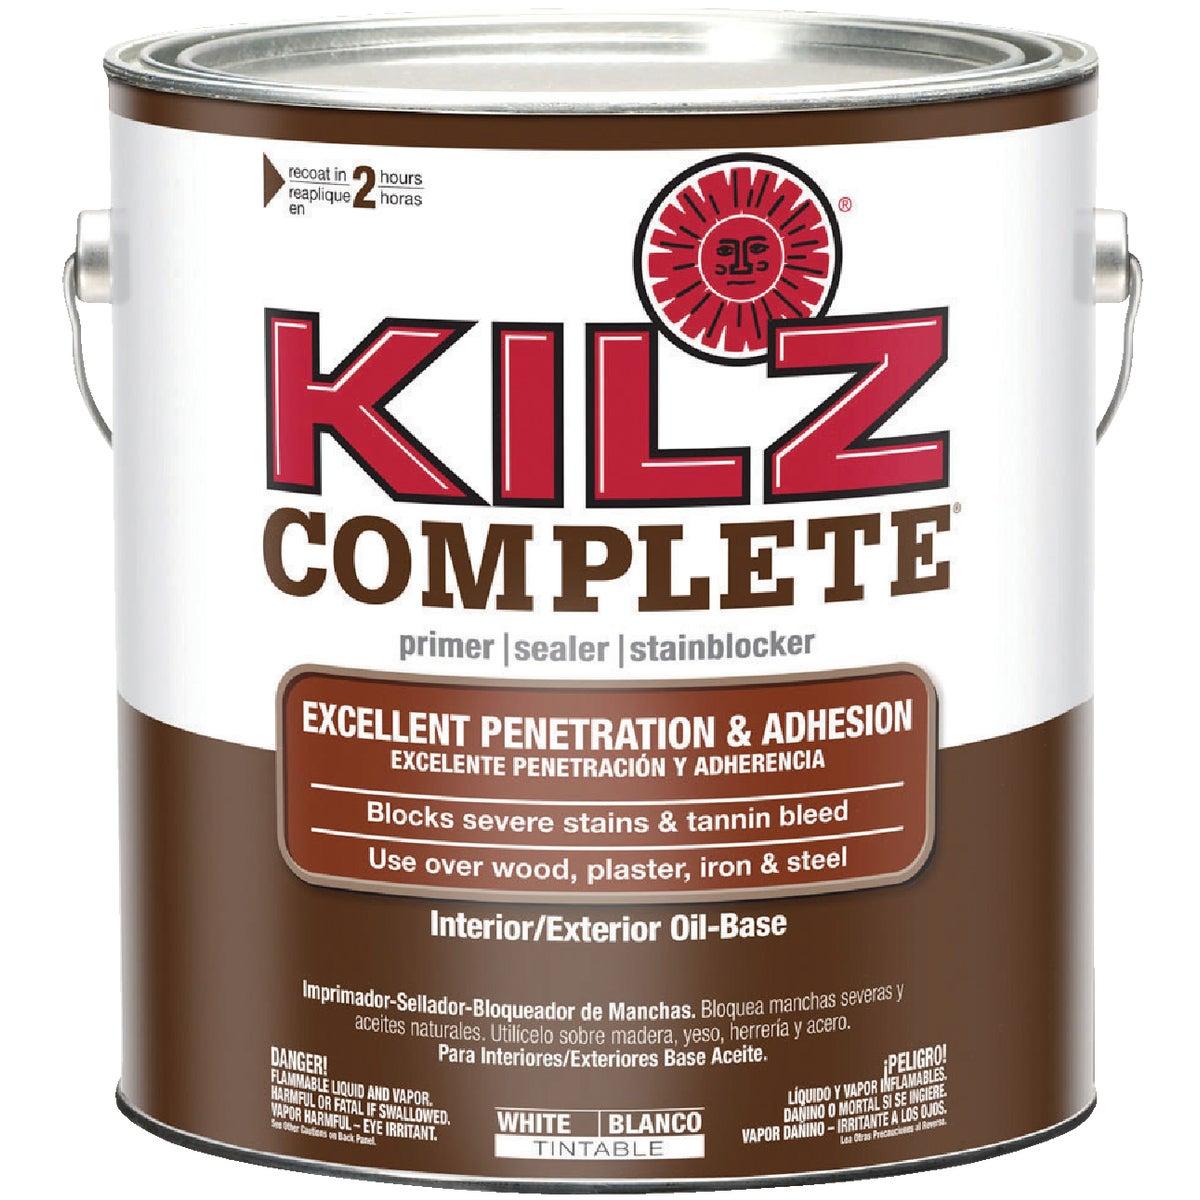 KILZ COMPLETE PRIMER - L101311 by Masterchem